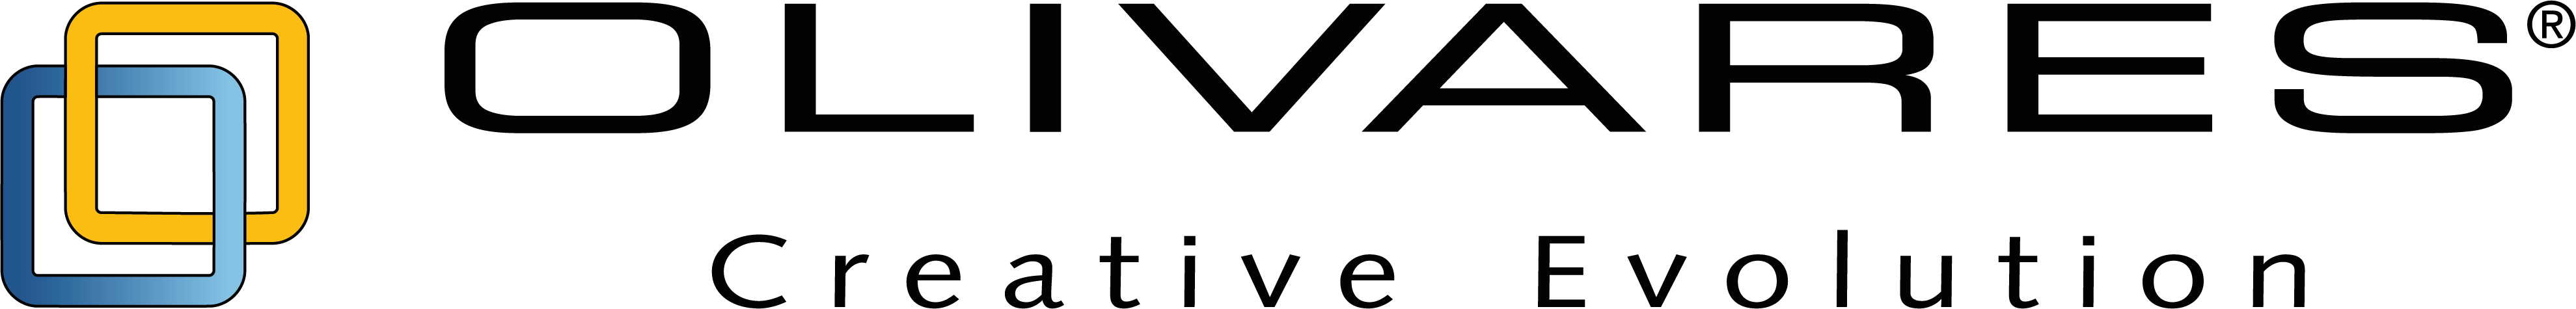 logo olivers per i partner tecnici